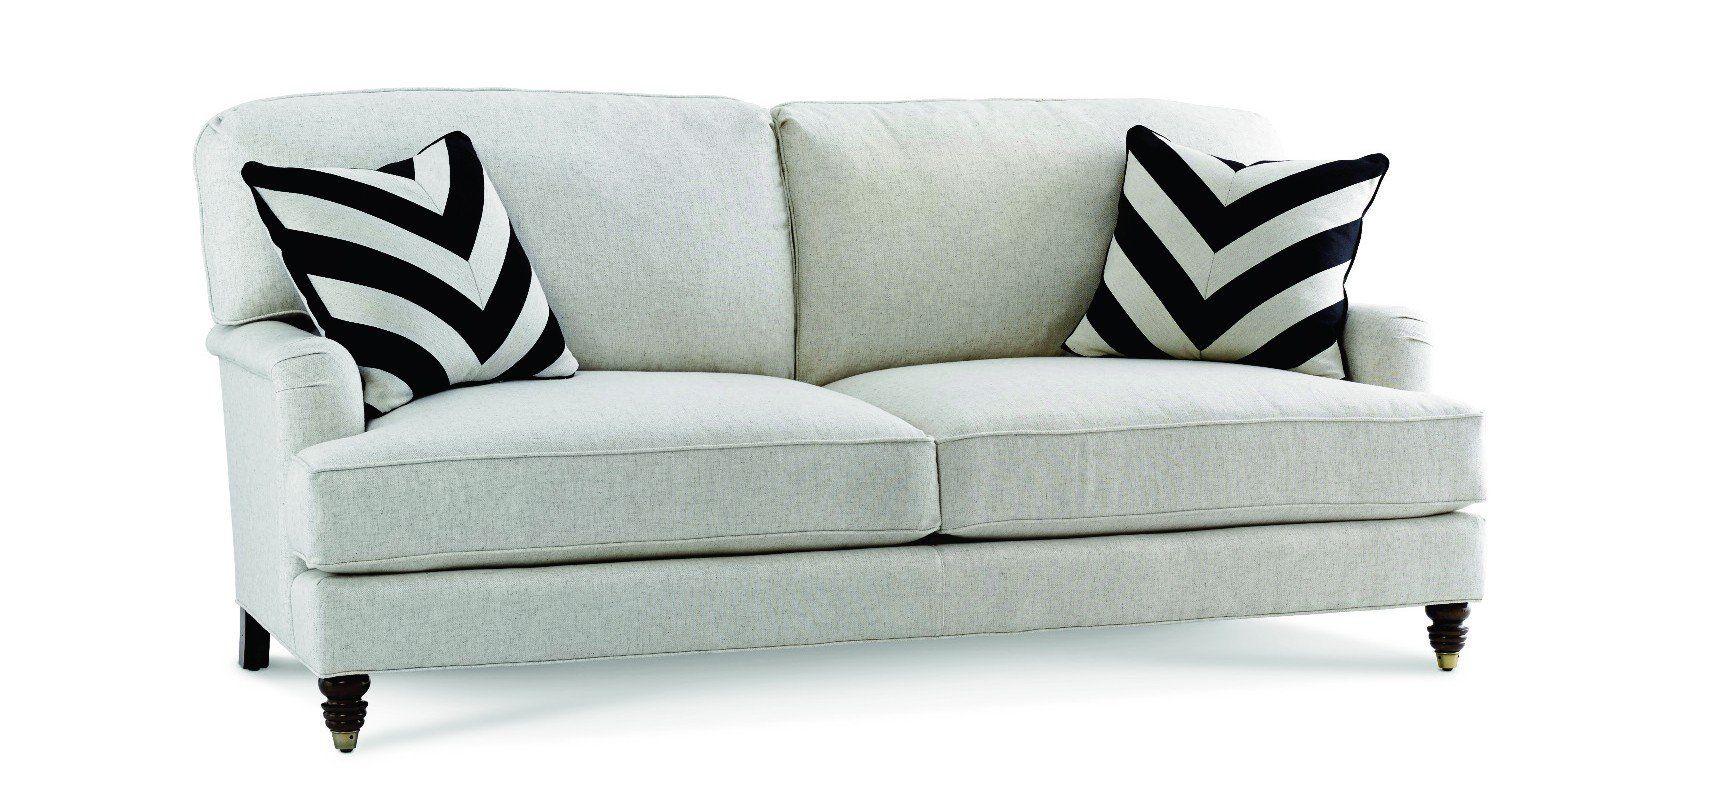 Miles Talbott Riley Sofa Upholstered Furniture Sofa Furniture